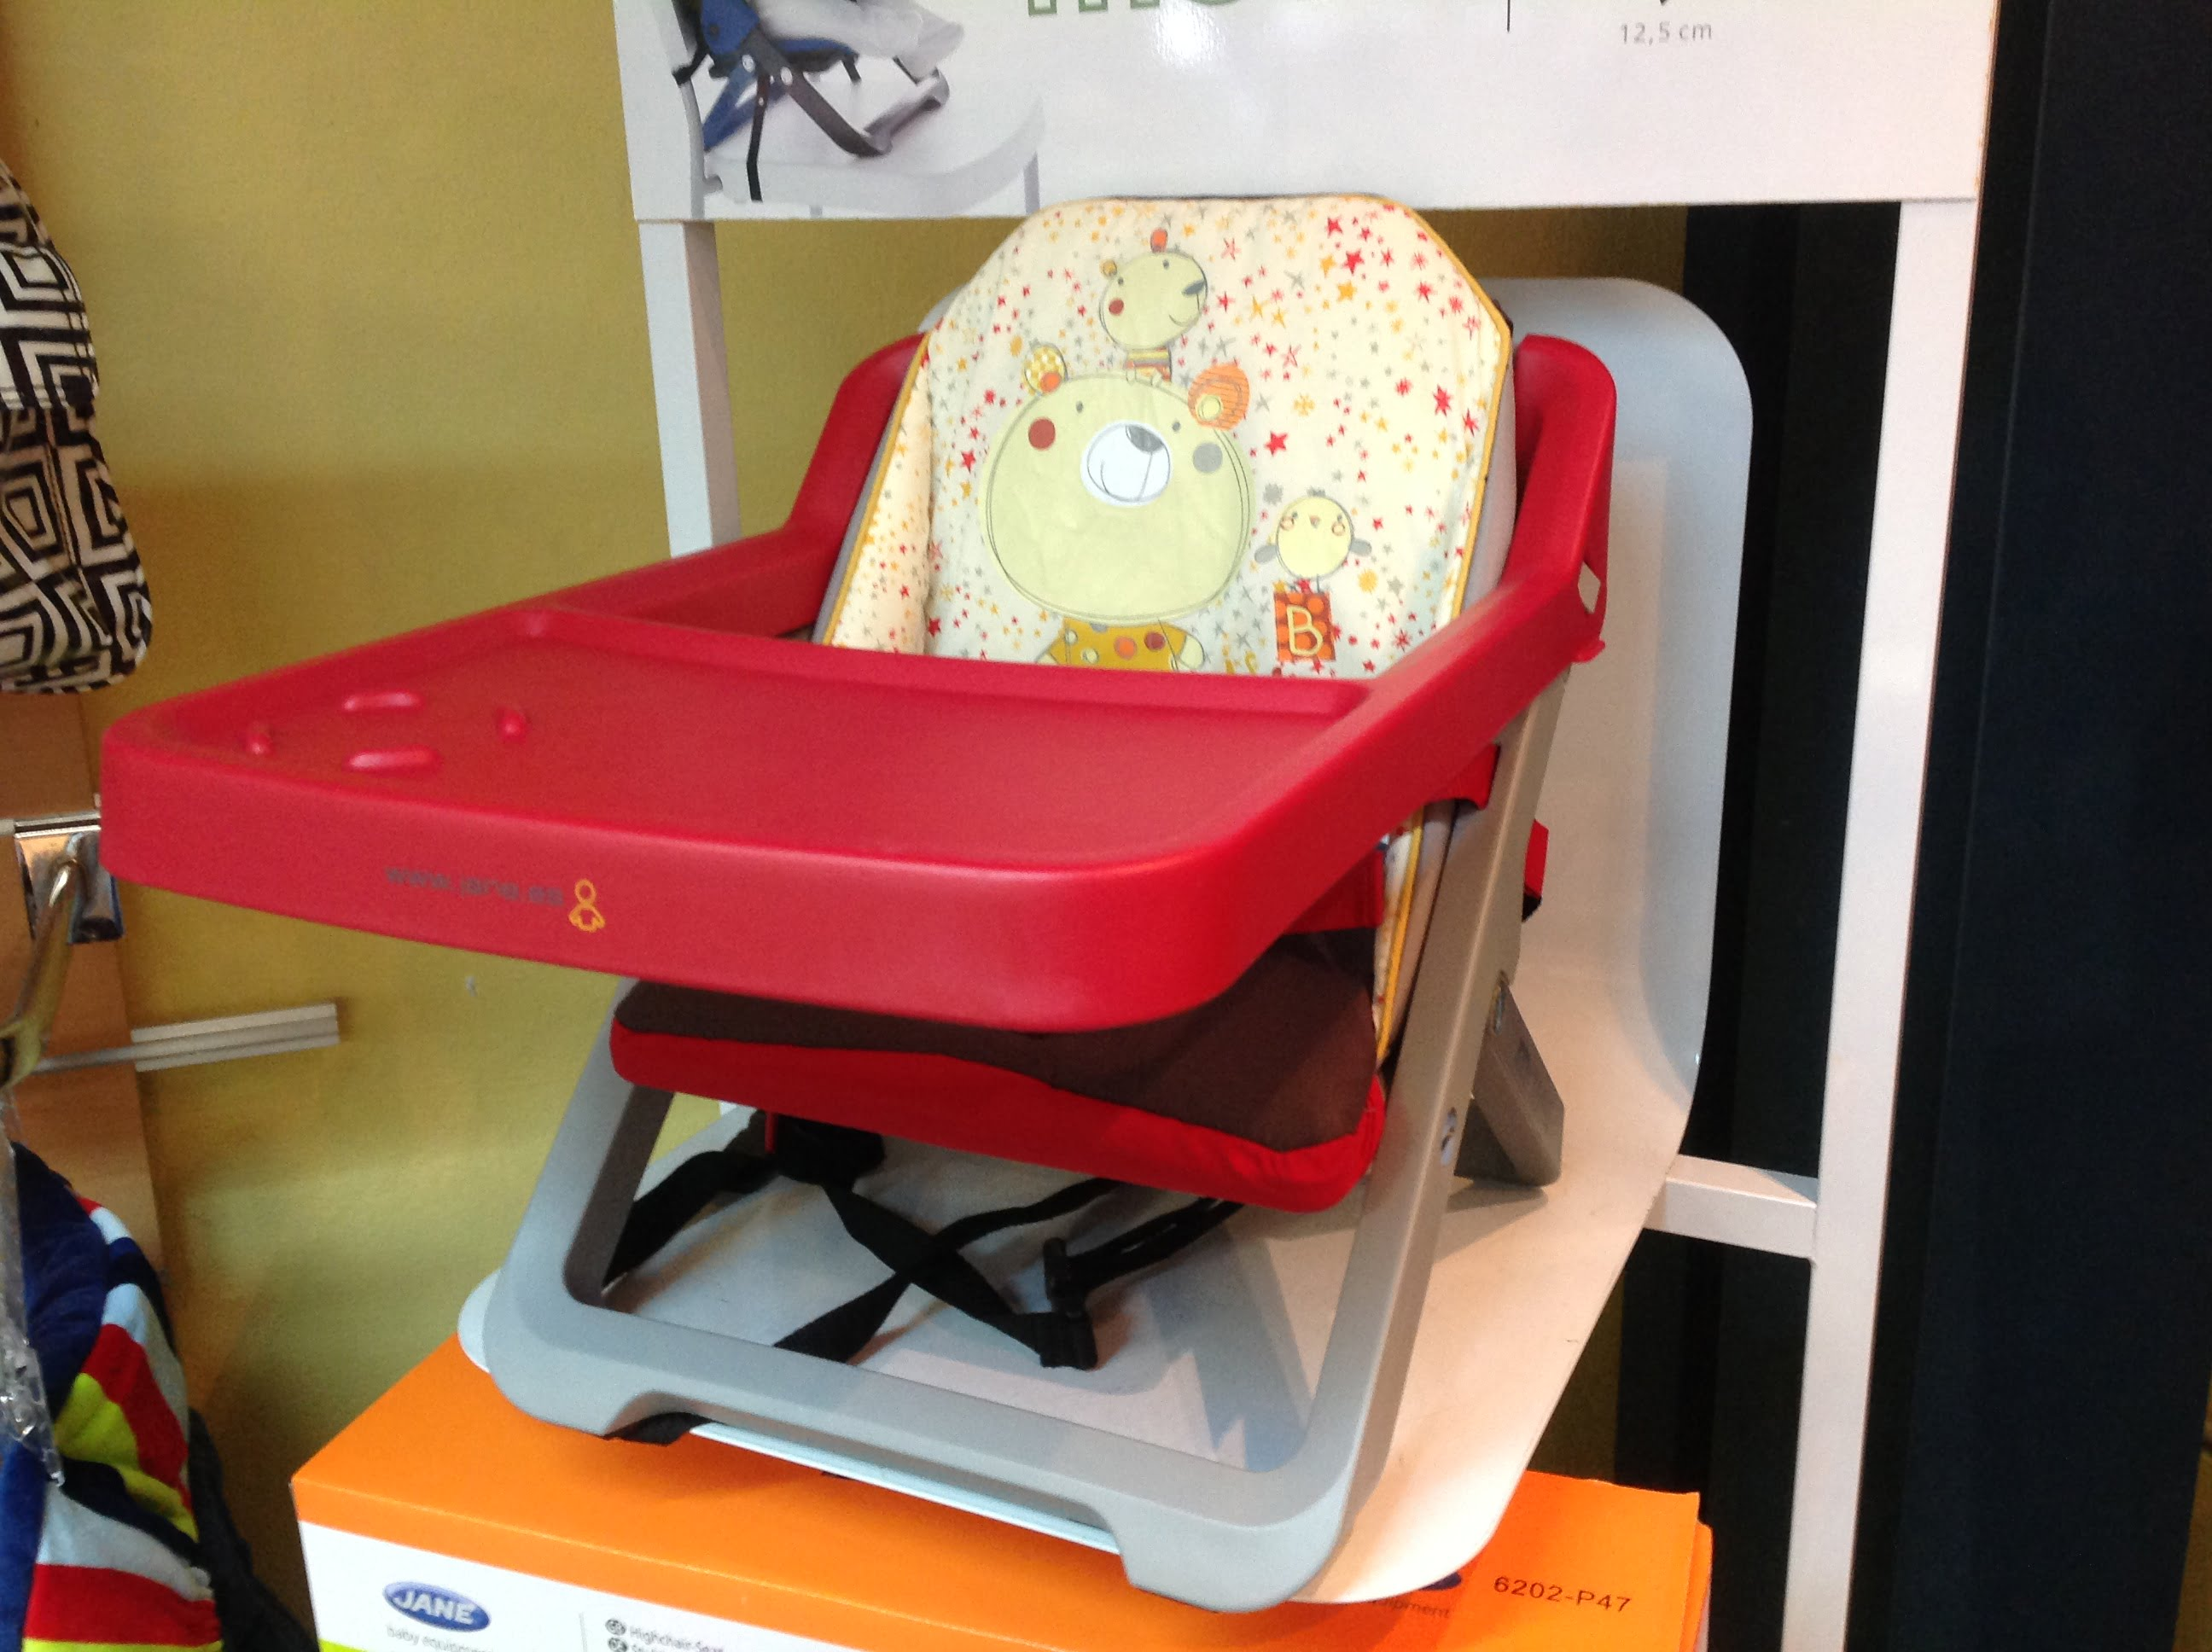 BabyShop cadira trona supletori